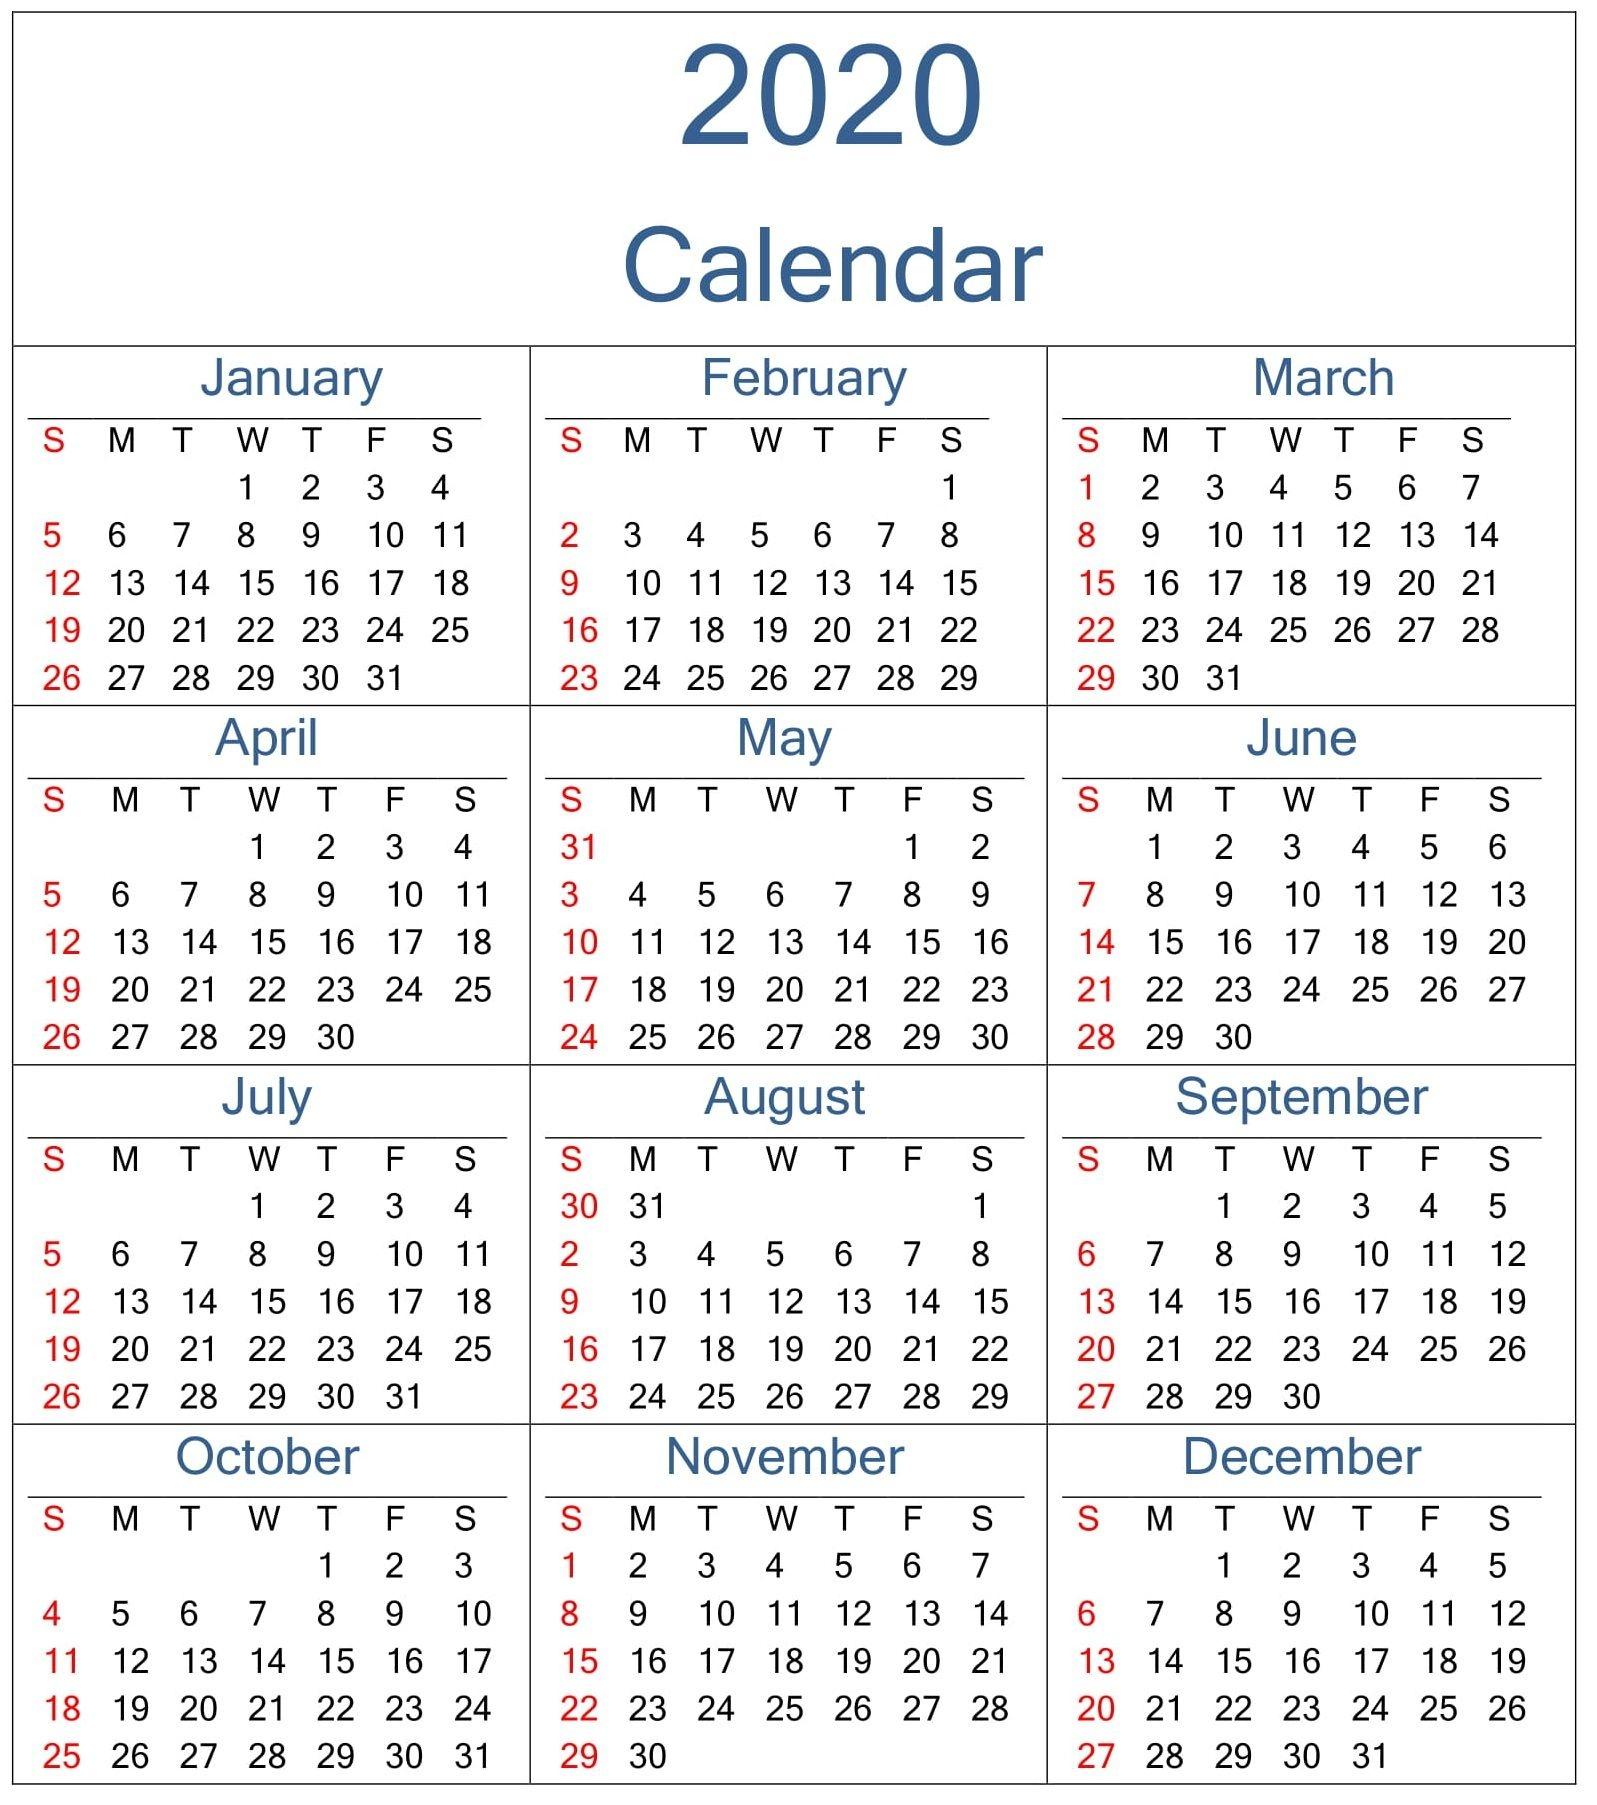 Get 2020 Monthly Calinder With Week Numbers | Calendar